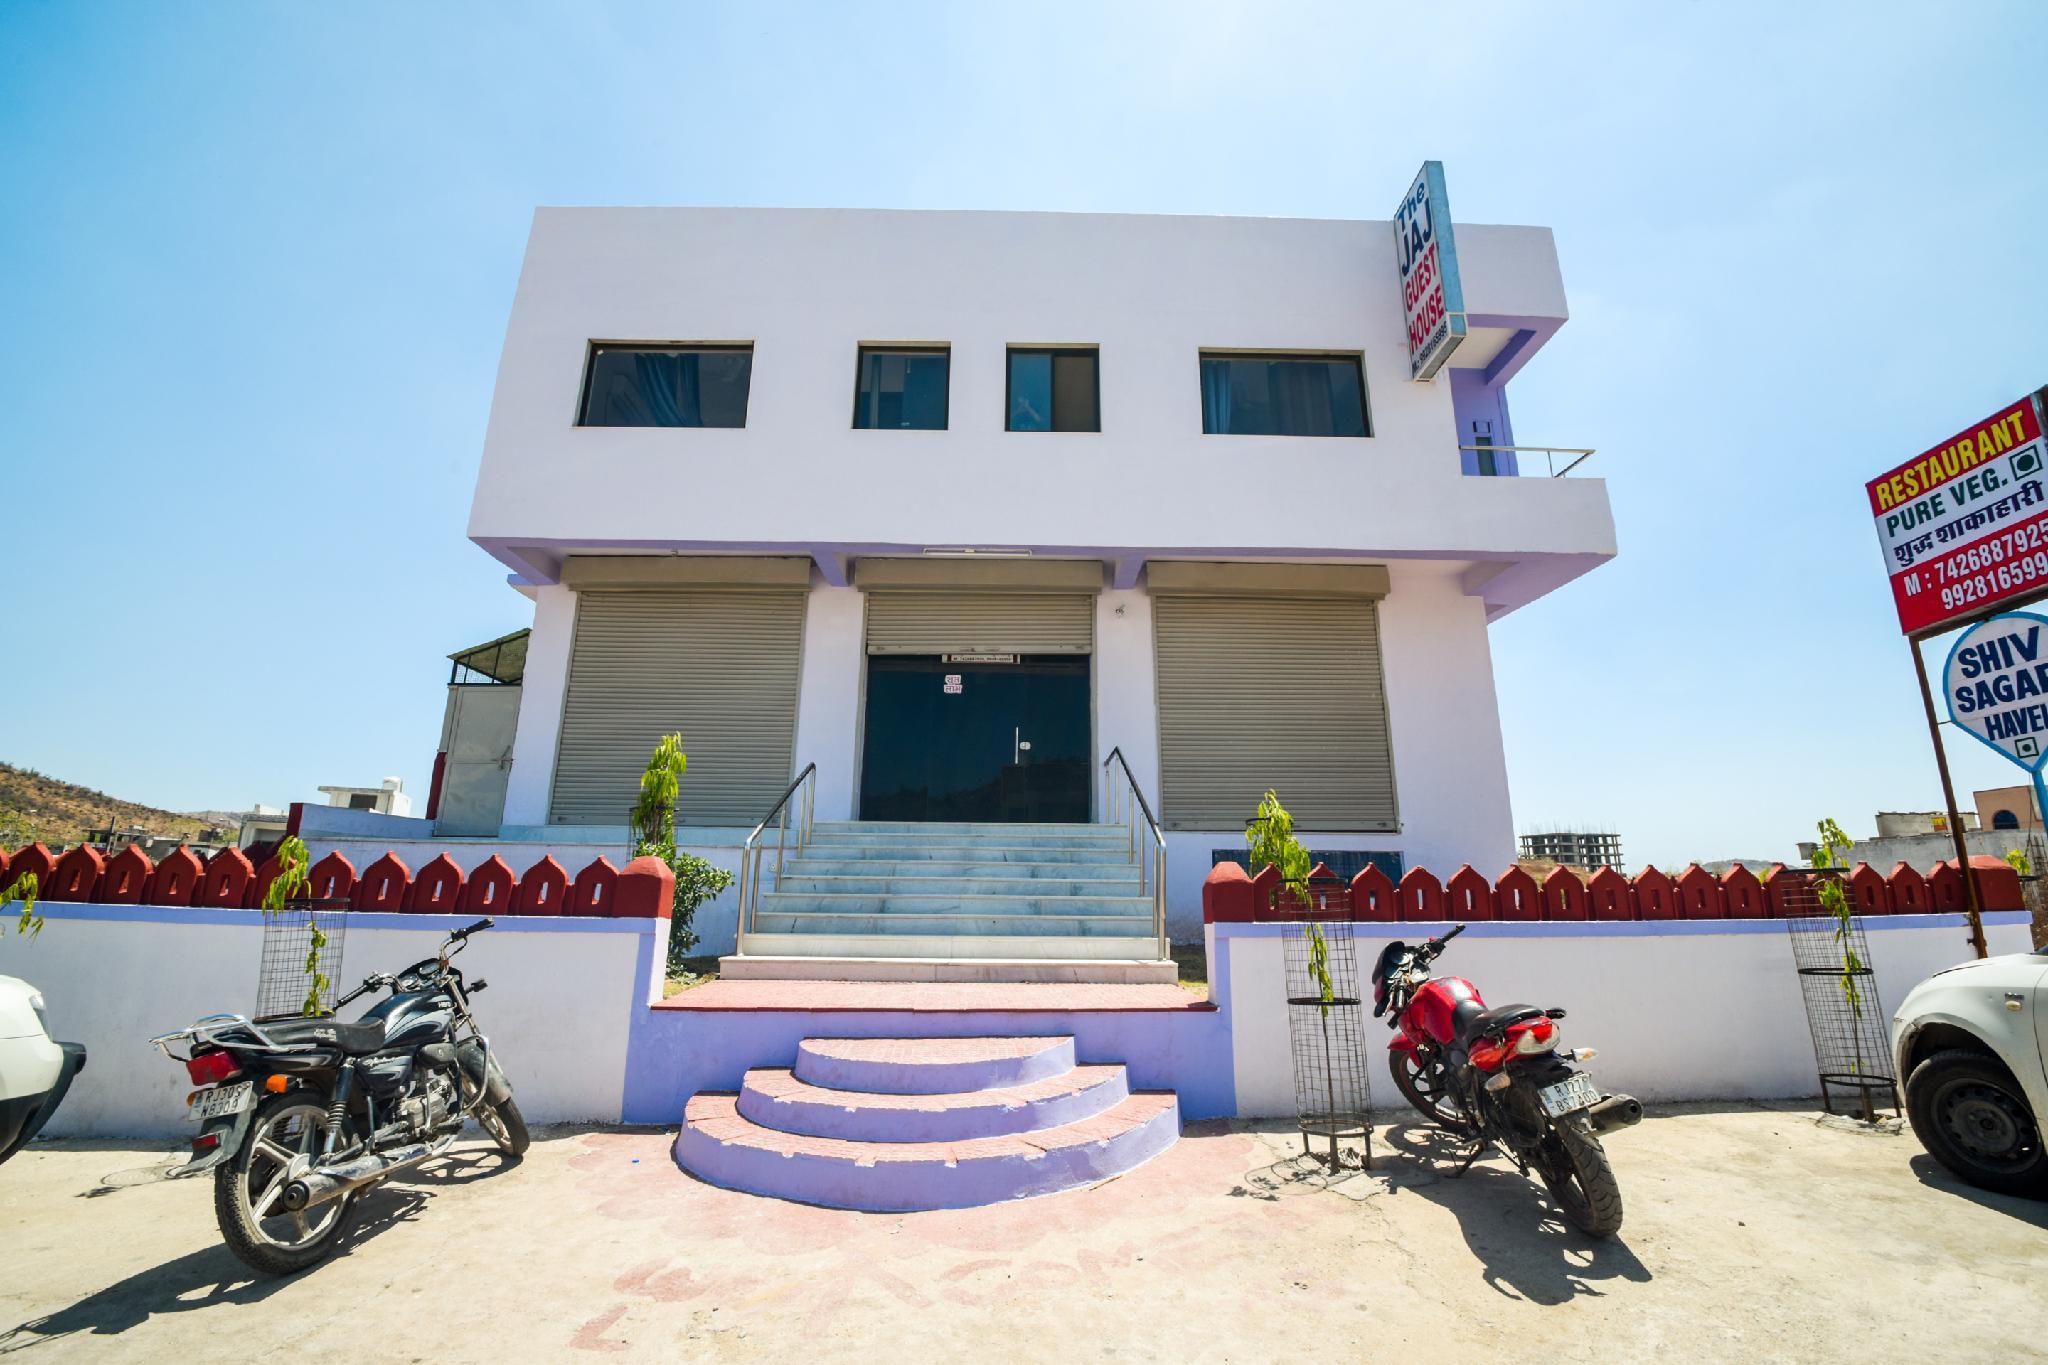 OYO 37130 Shiv Sagar Haveli